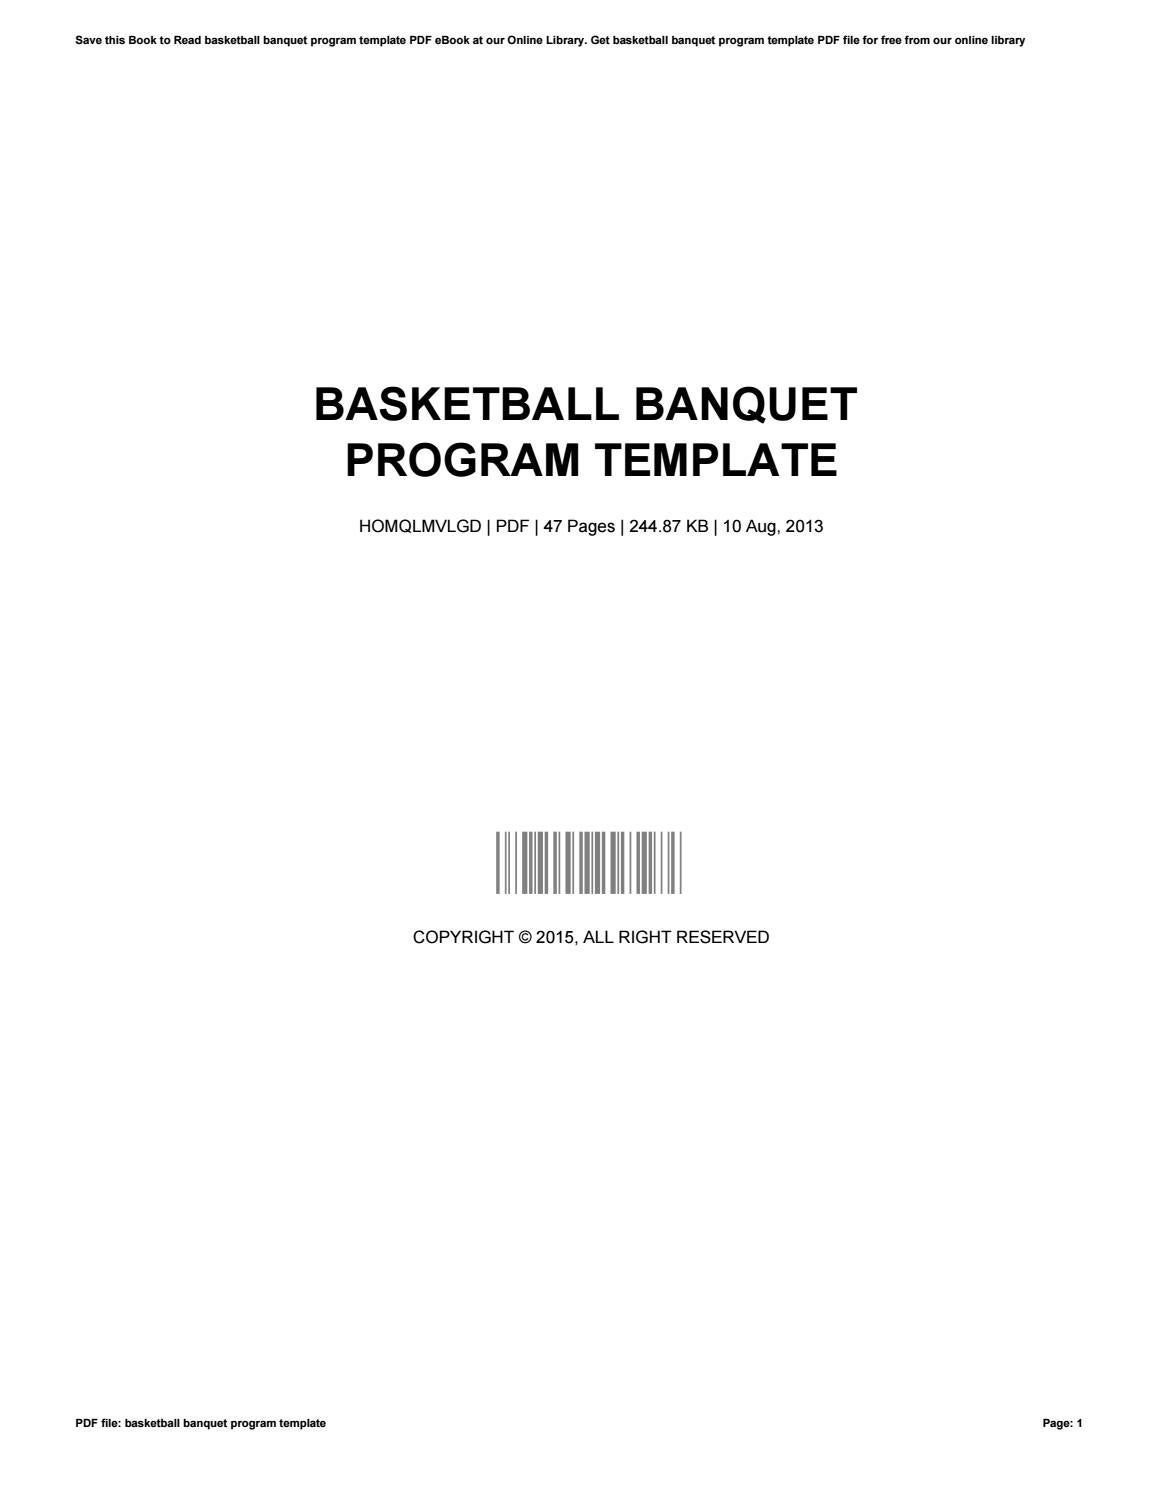 Banquet Program Template from image.isu.pub